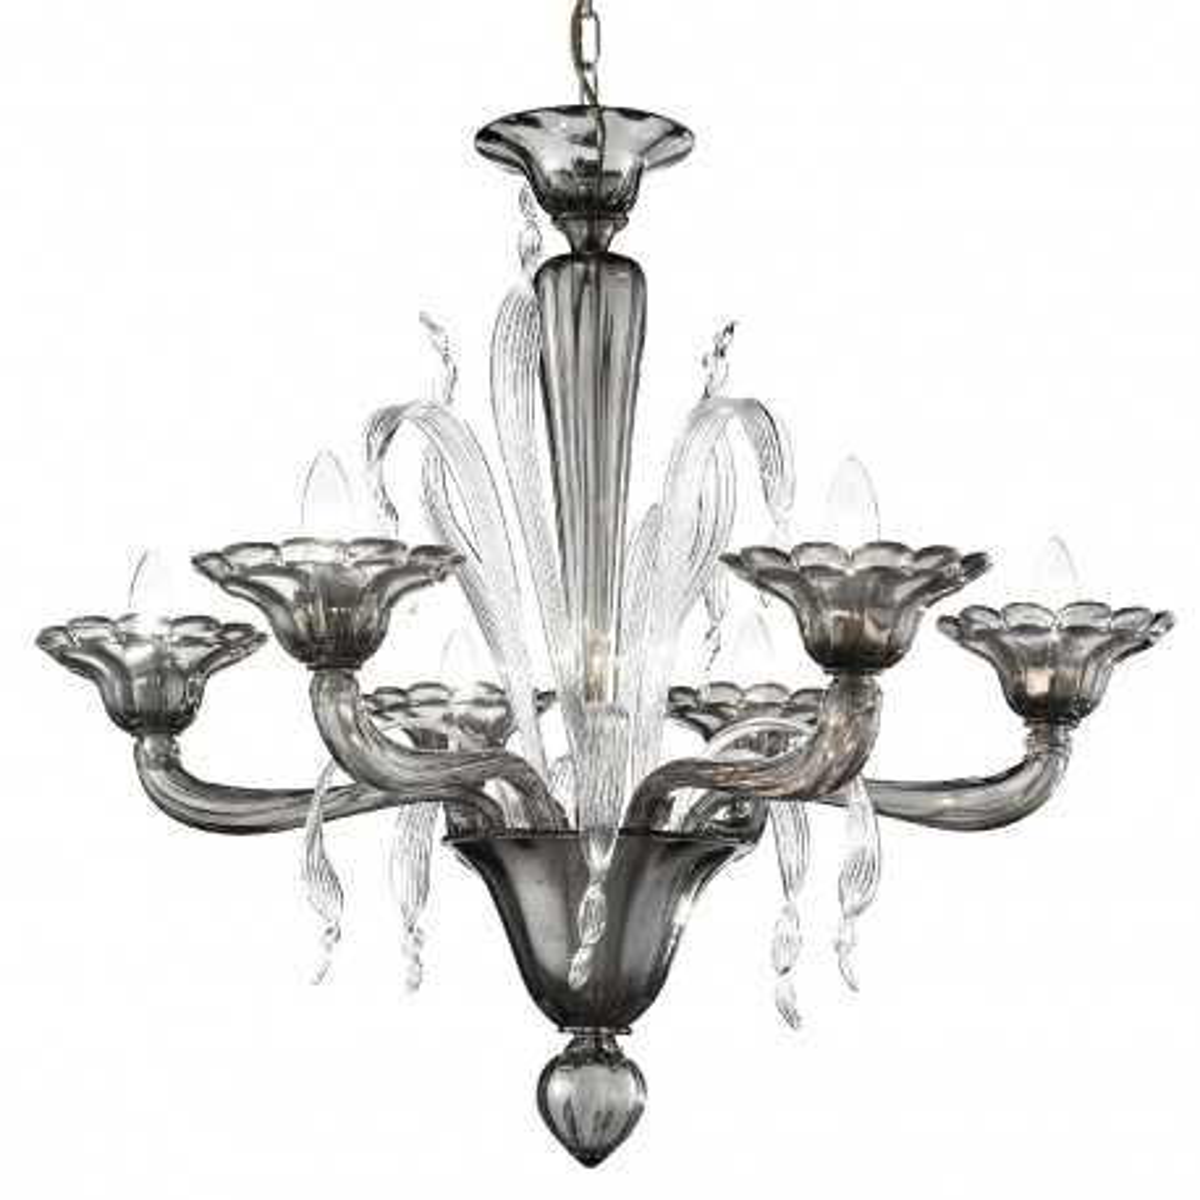 """Nereo"" araña de cristal de Murano - 6 luces - humo y transparente"